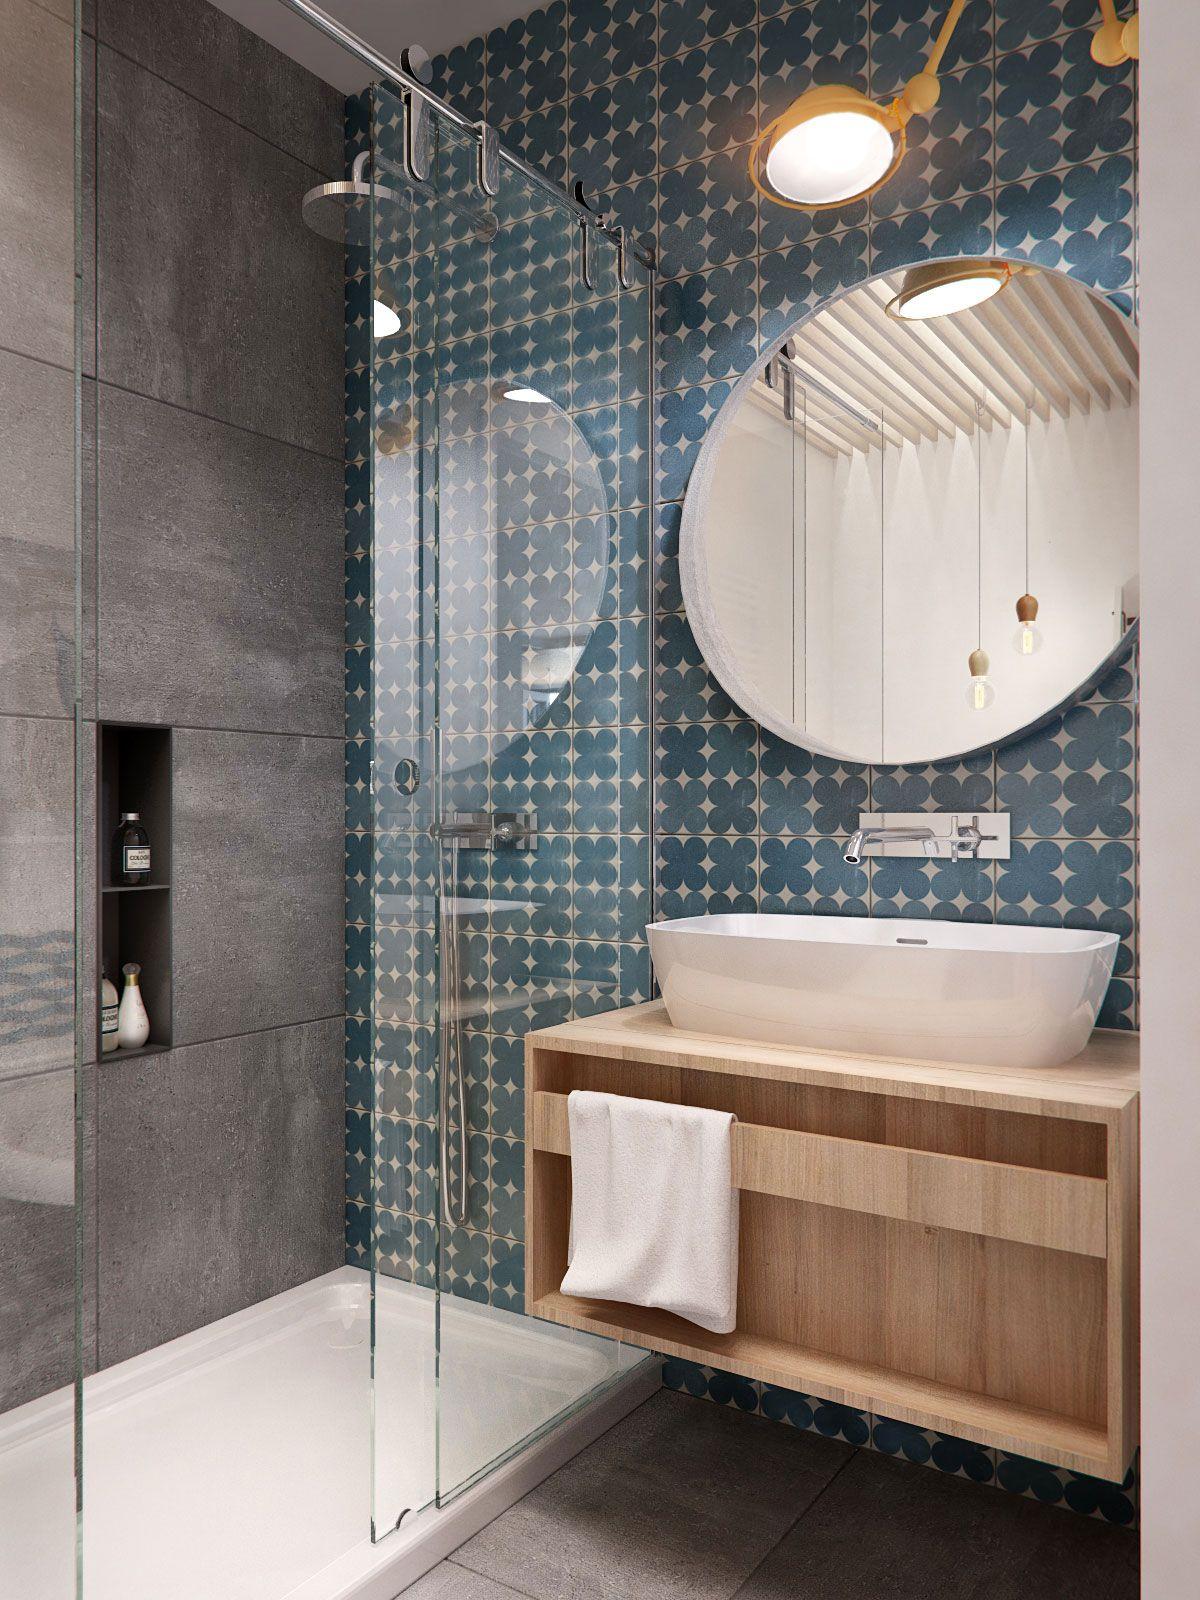 Petite Salle De Bain Design Recherche Google Salle De - Salle de bain design 2015